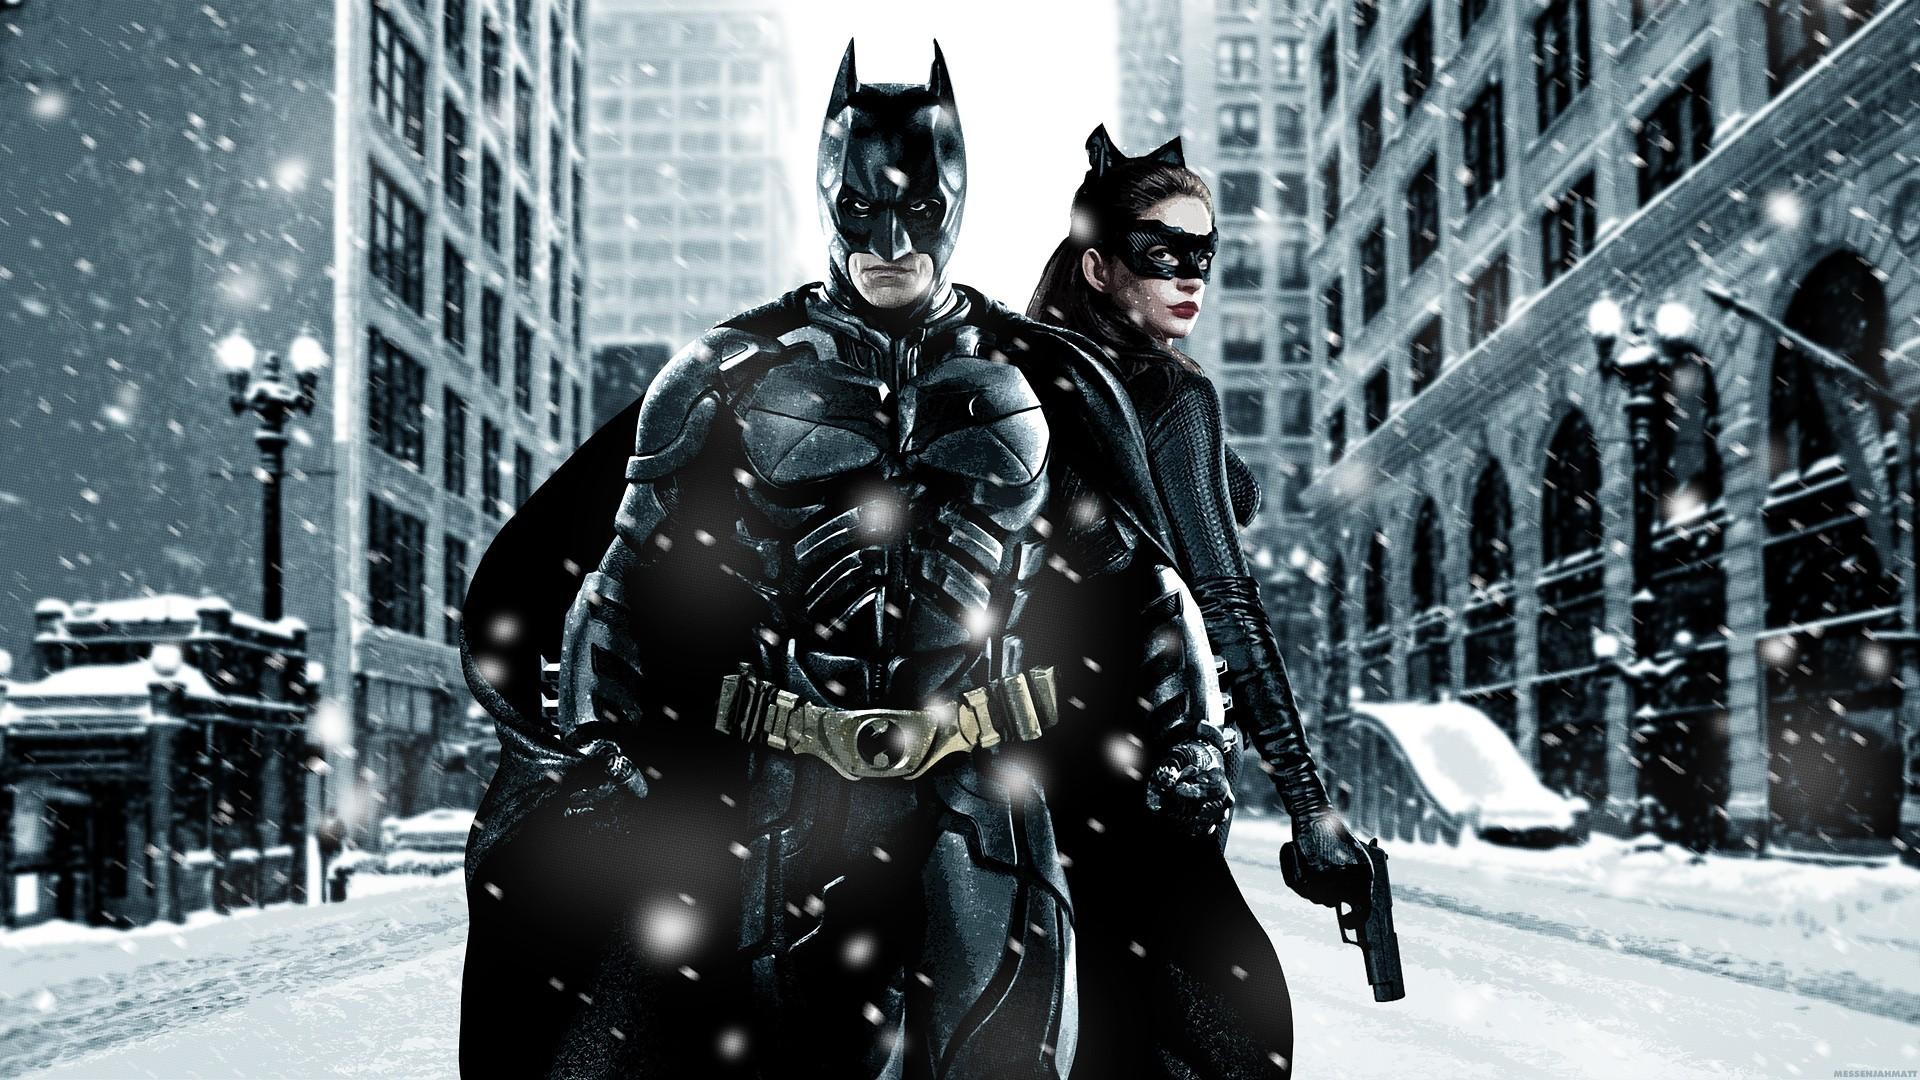 Batman HD Desktop Wallpaper